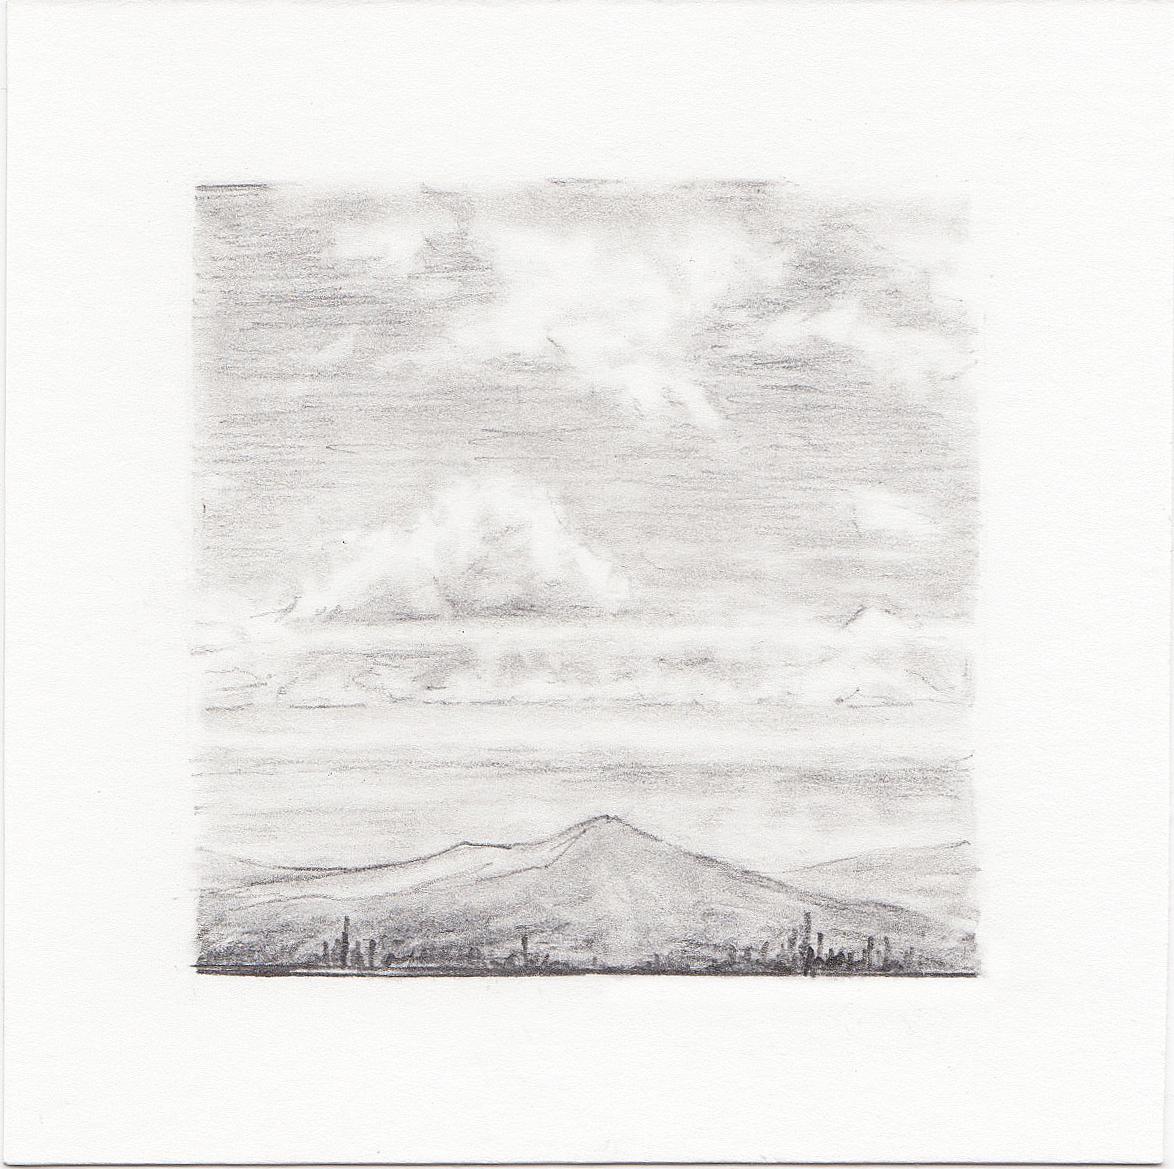 #22 Bonneville Shoreline Trail, Salt Lake City,Utah | 3x3 | graphite